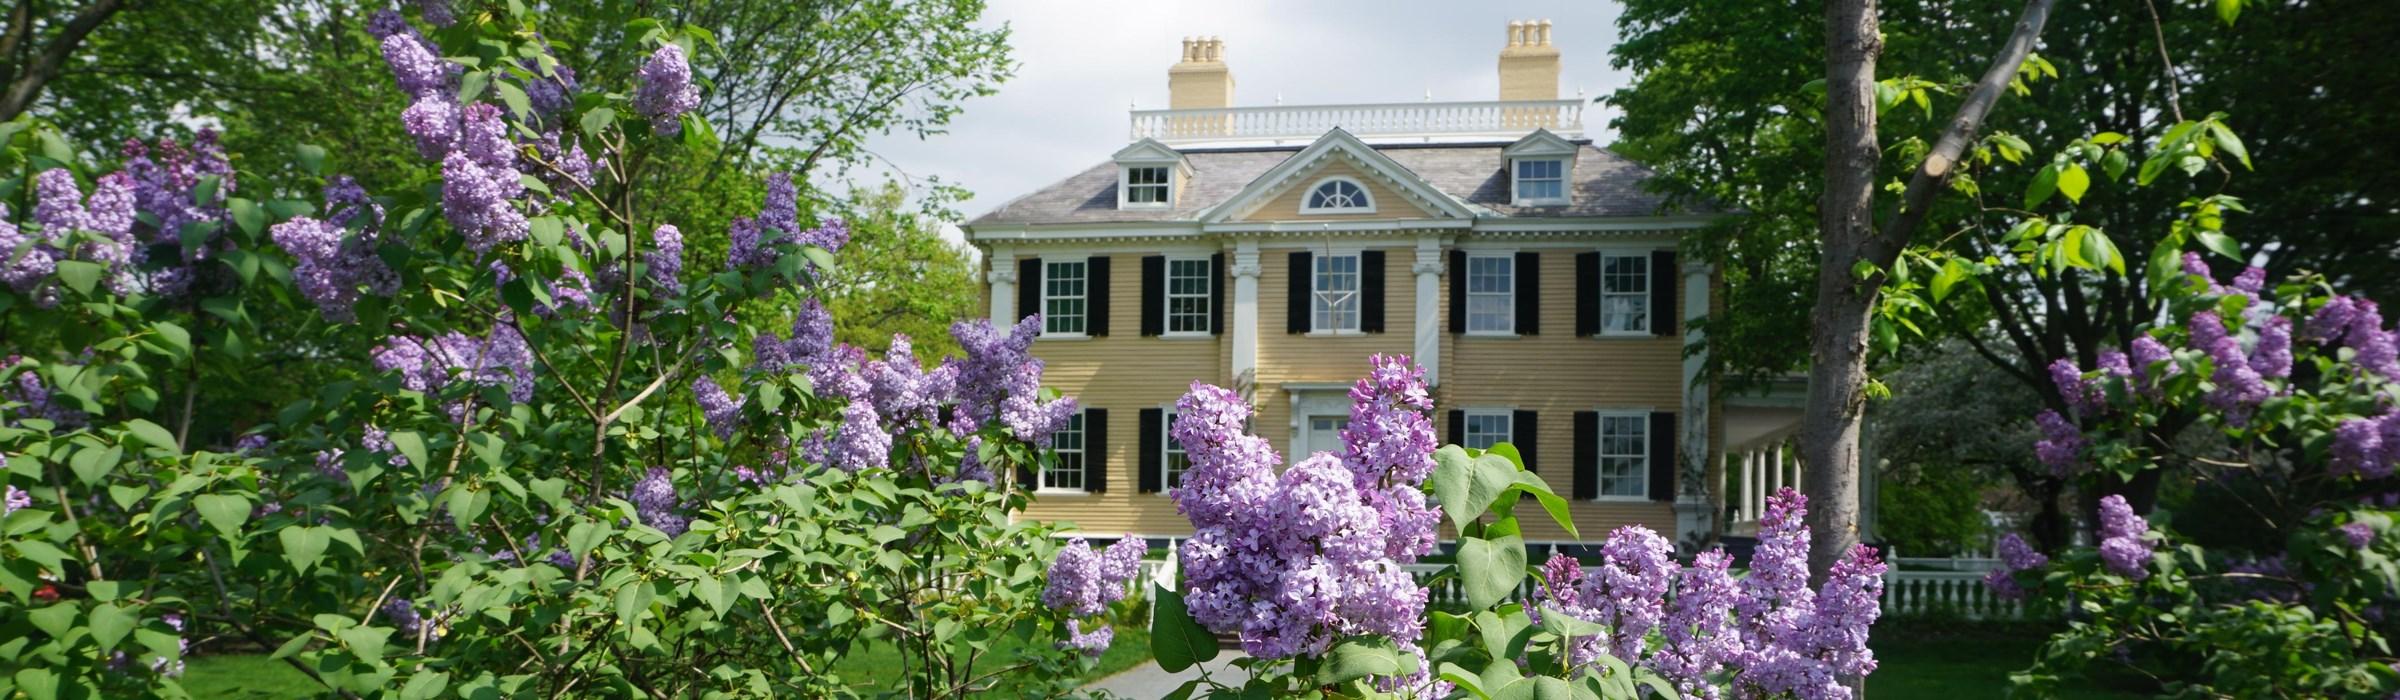 Longfellow House Washington's Headquarters National Historic Site (U.S. National Park Service)